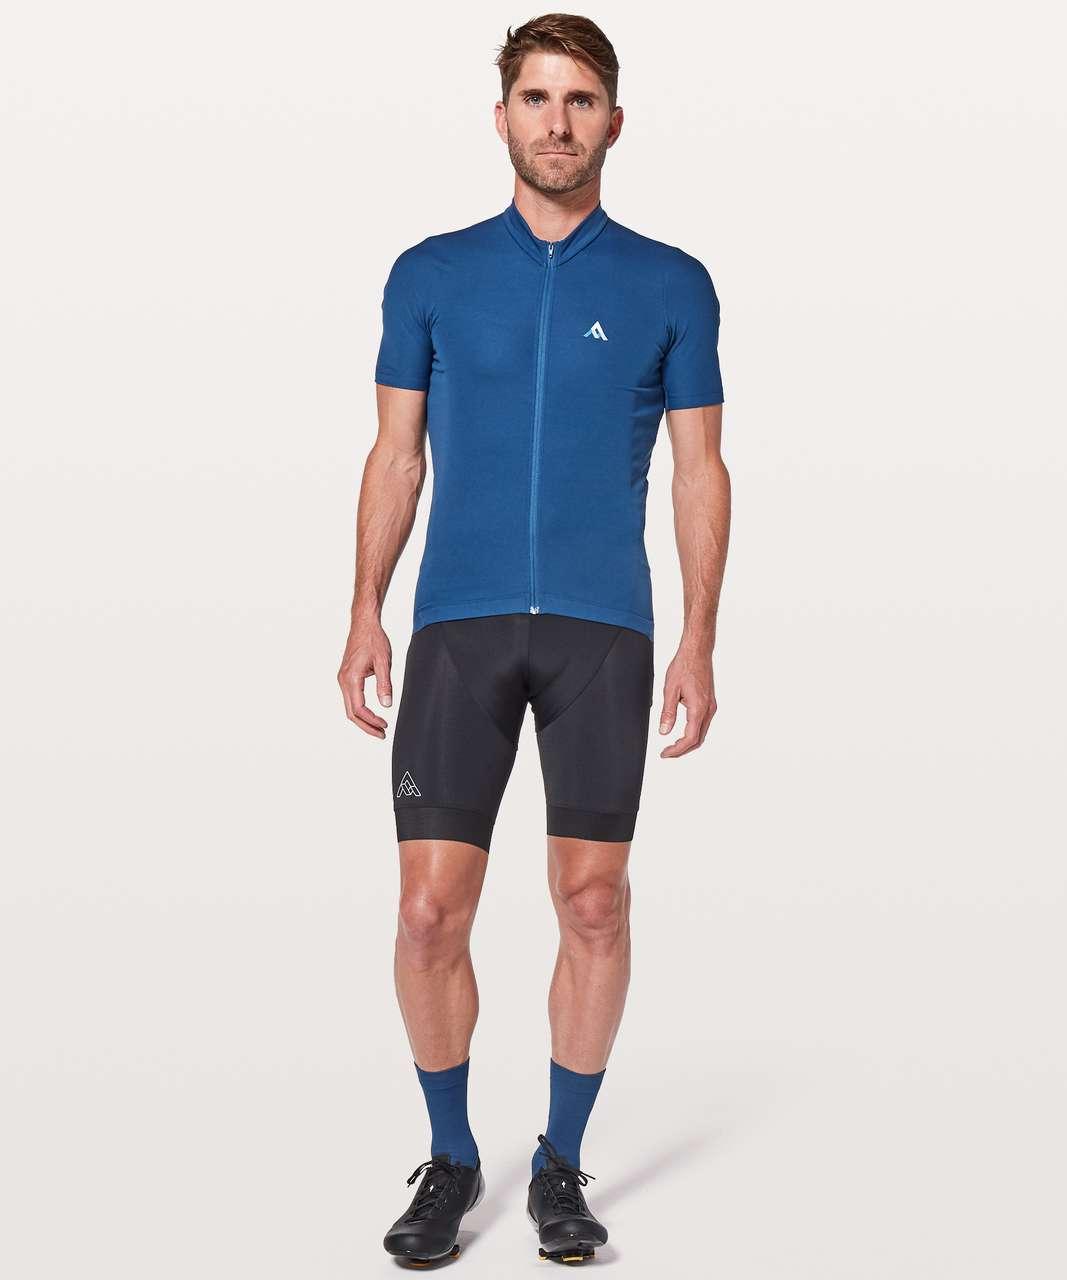 Lululemon 7Mesh Quantum Jersey Short Sleeve - Cadet Blue